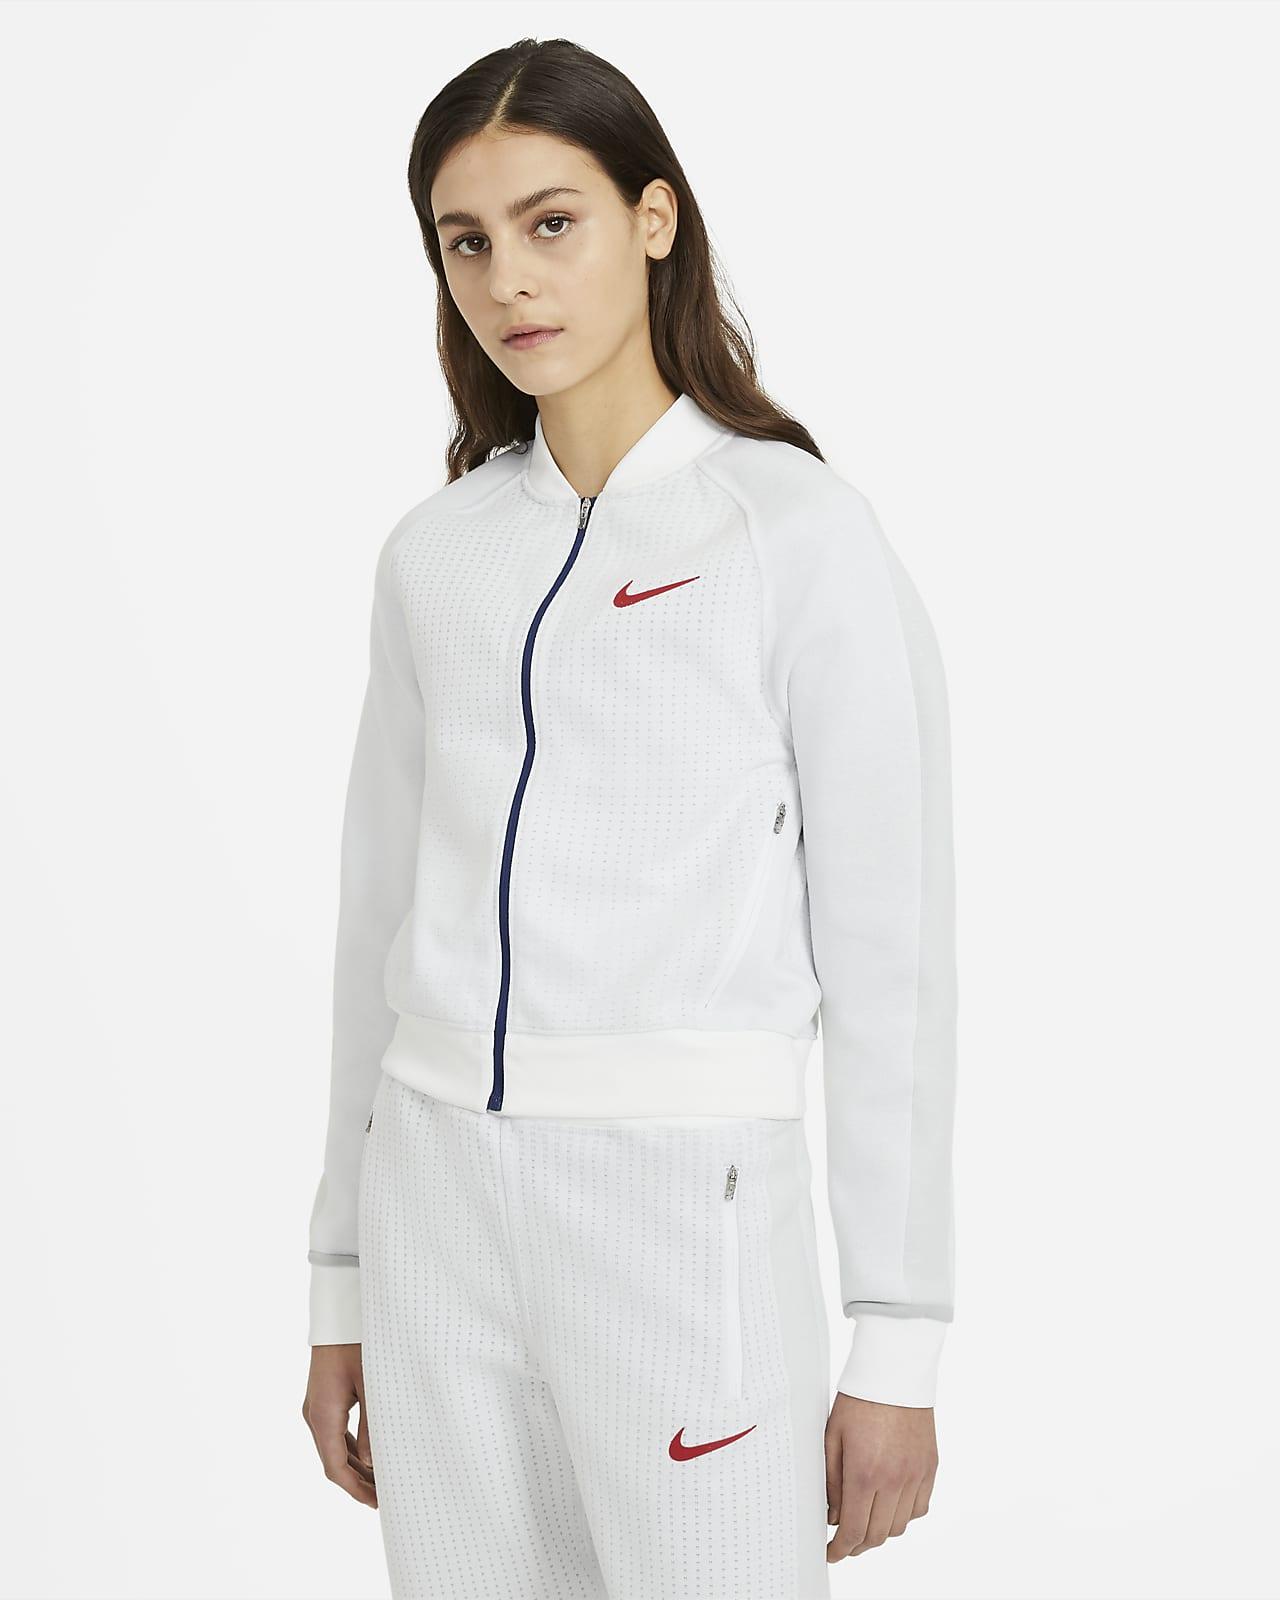 Chamarra para mujer Nike Sportswear